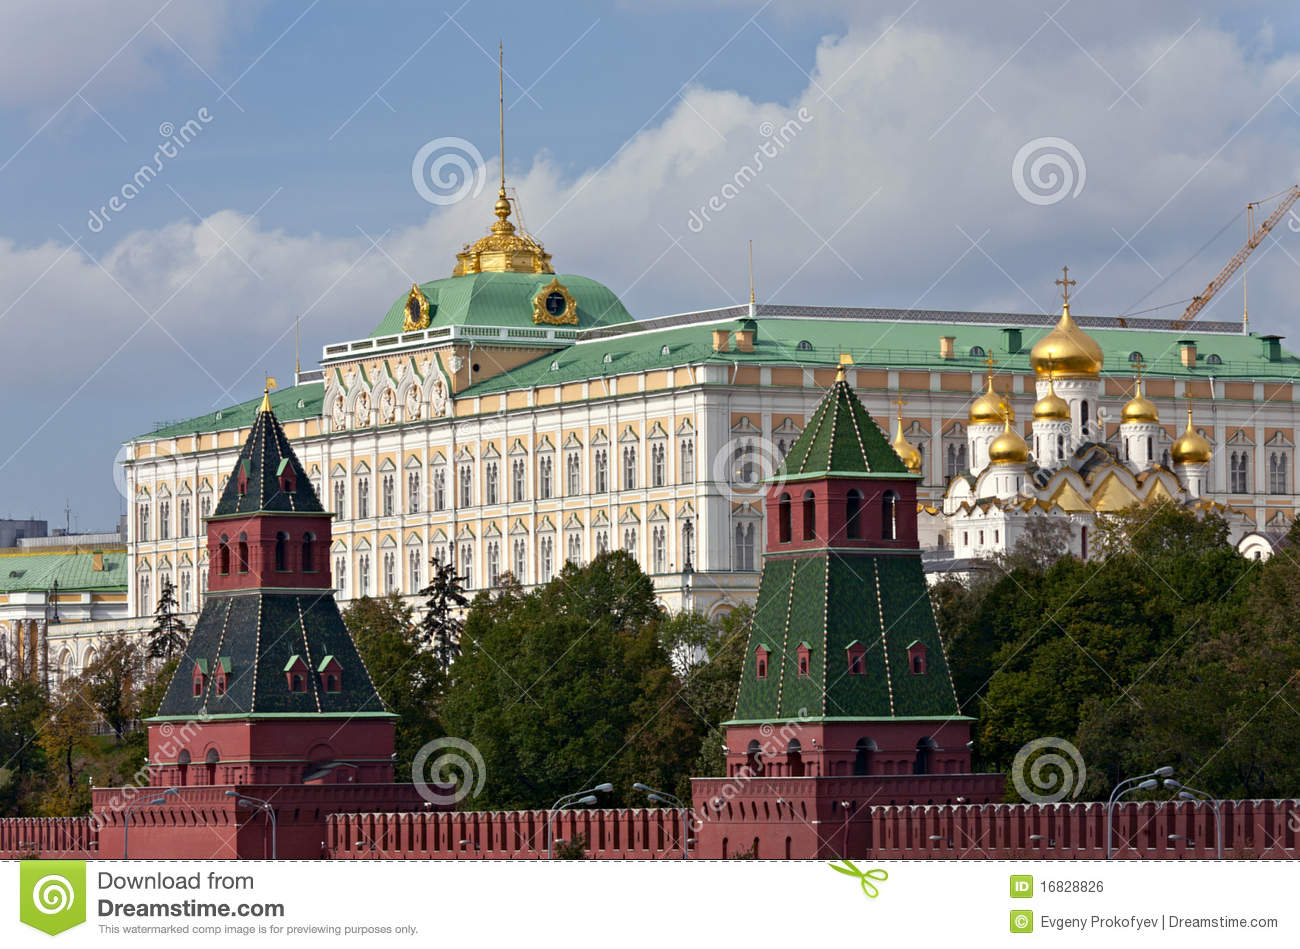 Grand kremlin palace clipart #18